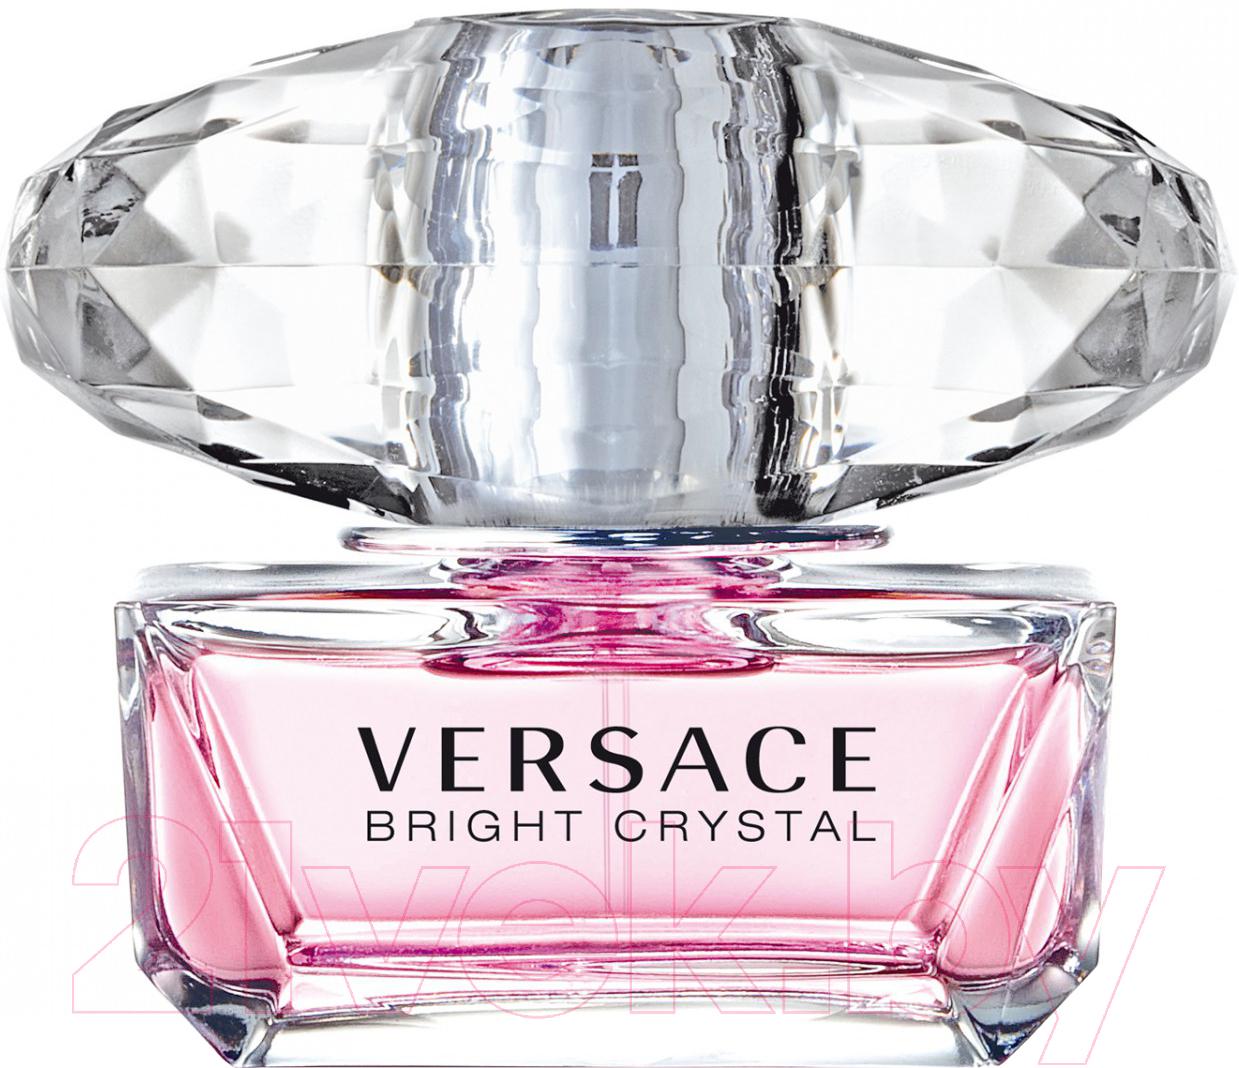 Купить Туалетная вода Versace, Bright Crystal (50мл), Италия, Bright Crystal (Versace)